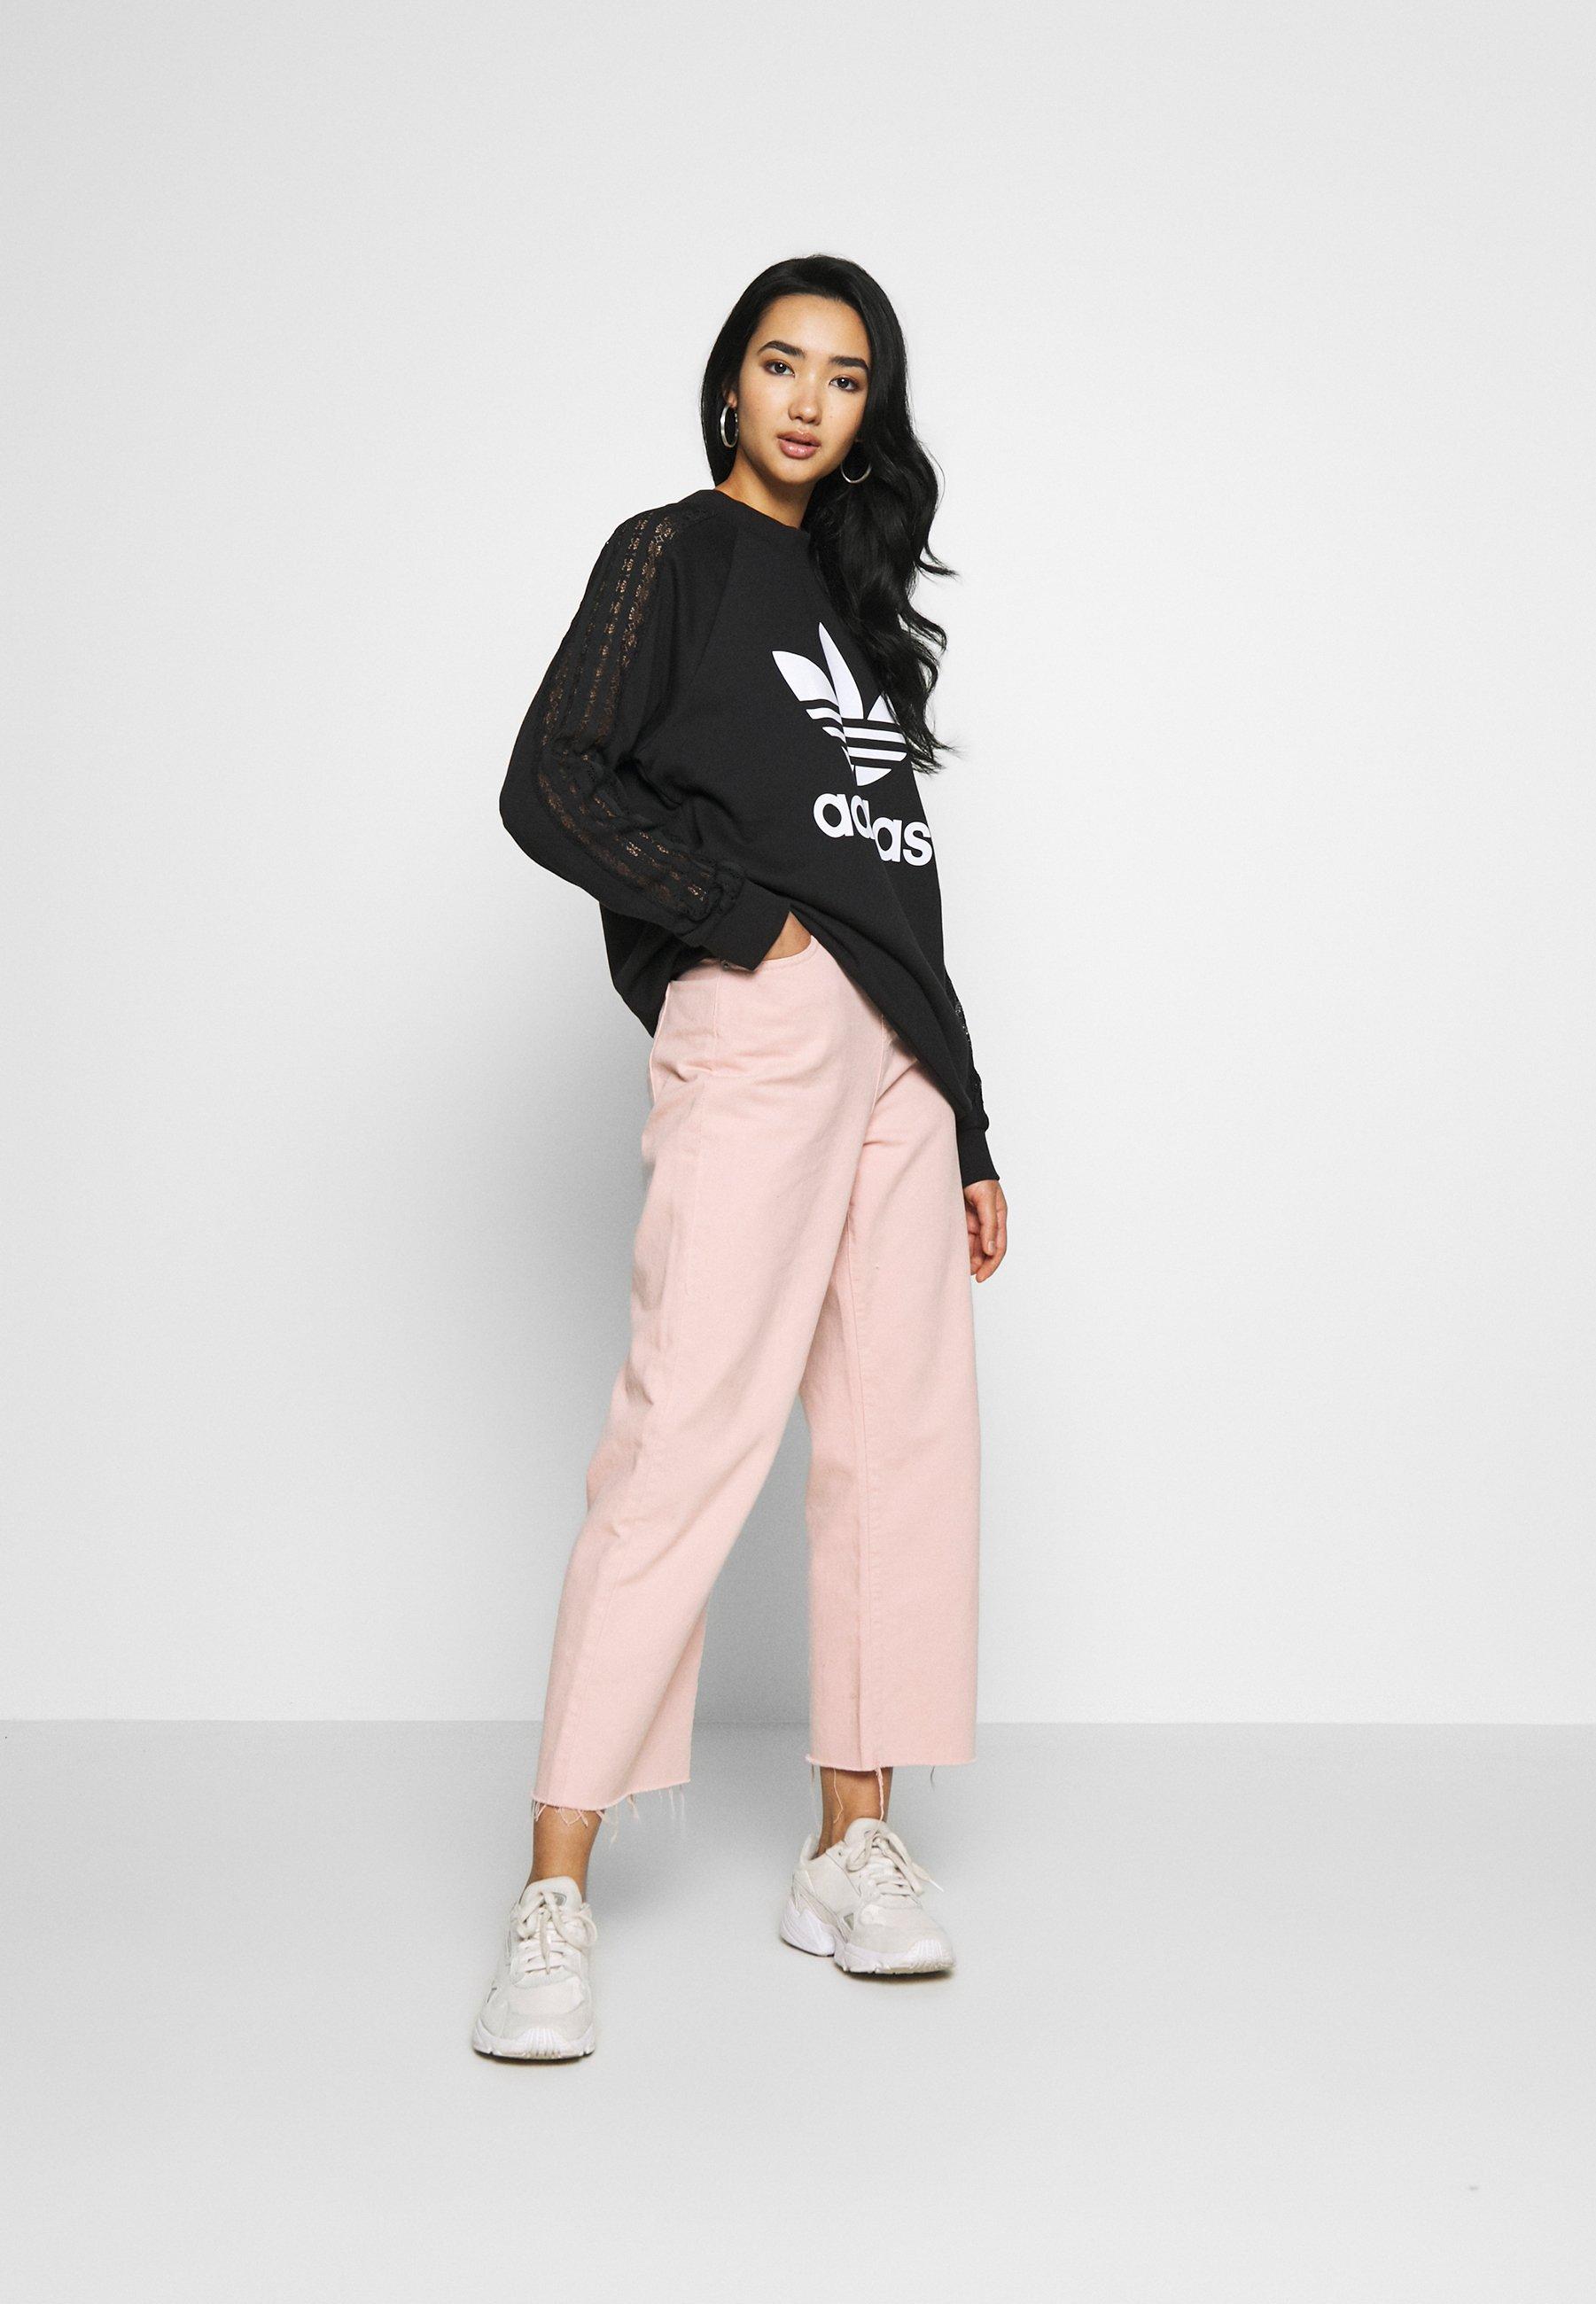 Adidas Originals Lace - Sweatshirts Black